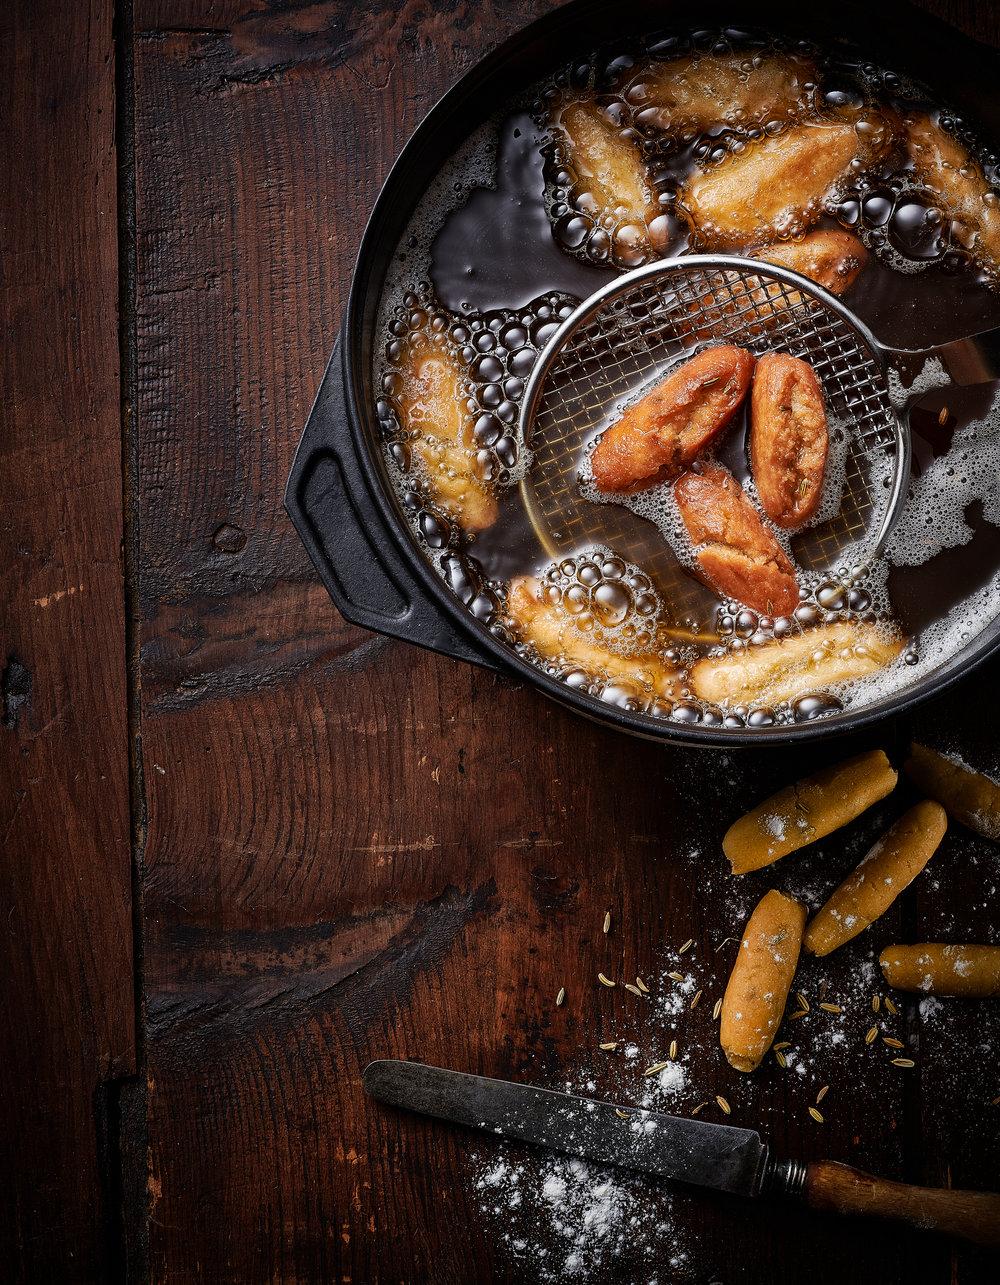 Le Menu, editorielle Foodfotografie